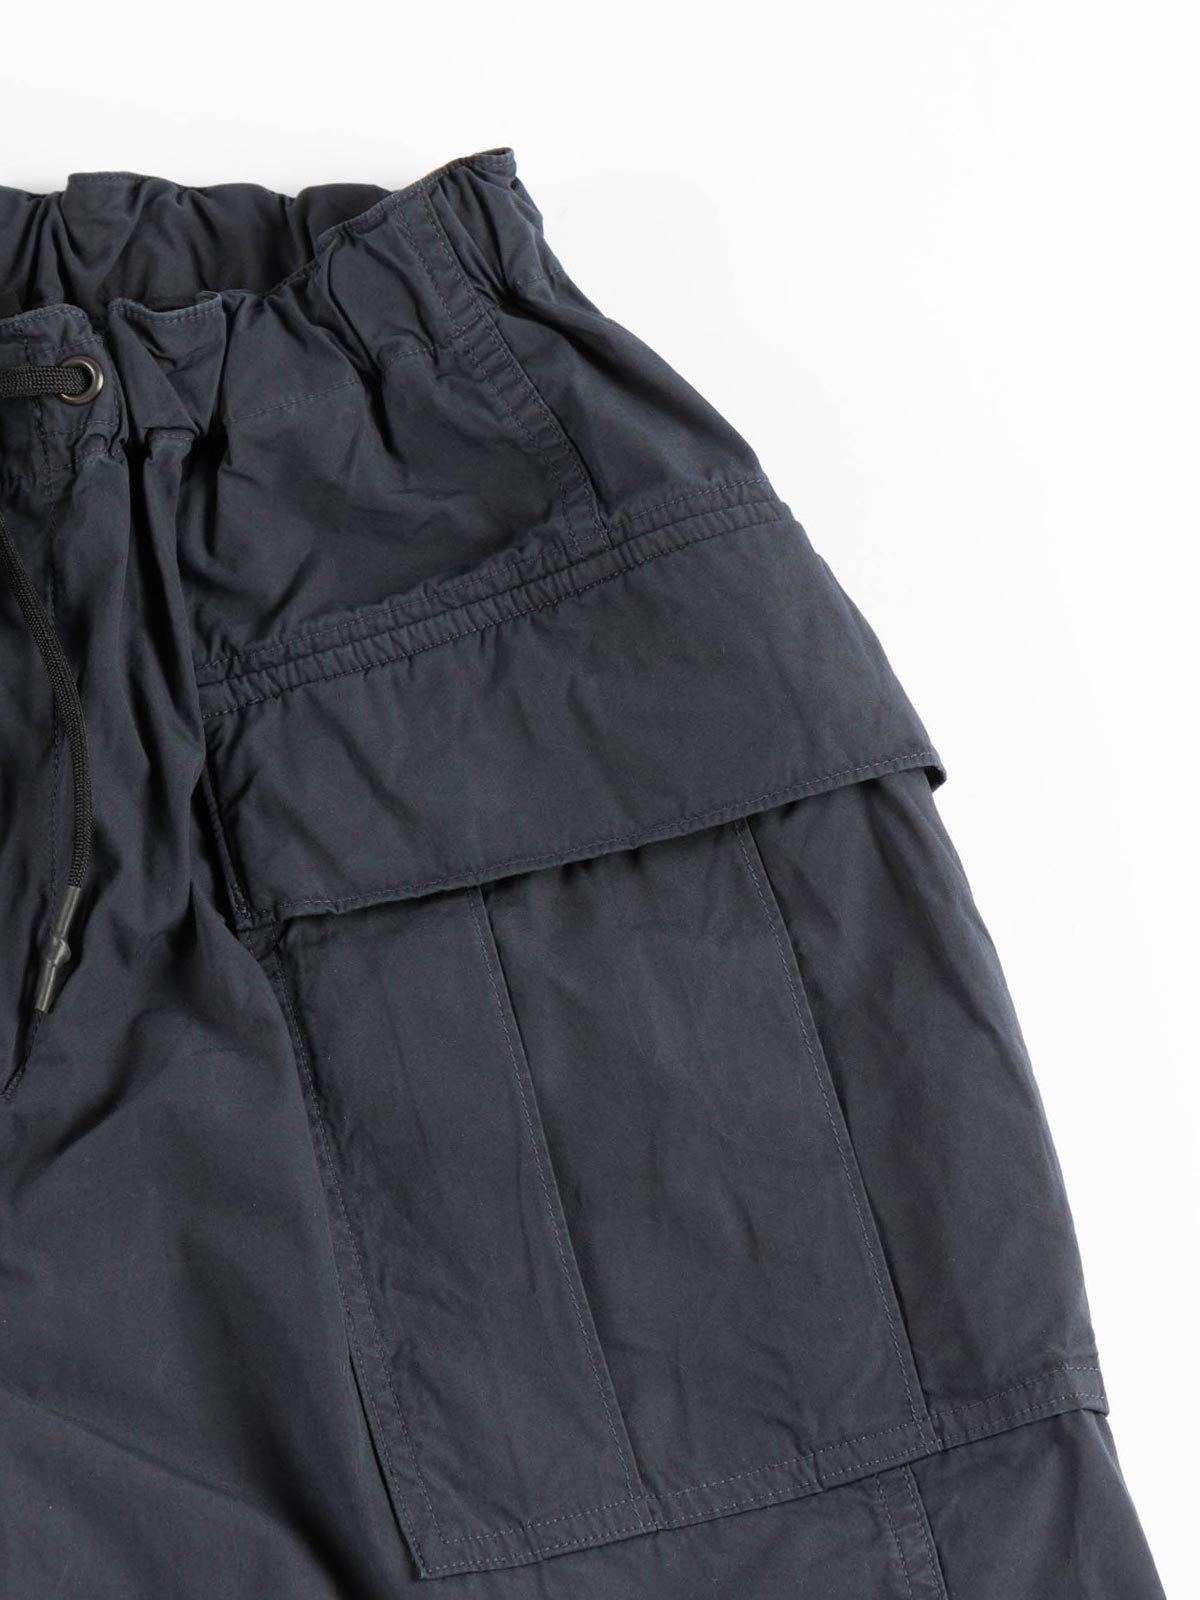 EASY CARGO SHORTS NAVY TYPEWRITER CLOTH - Image 3